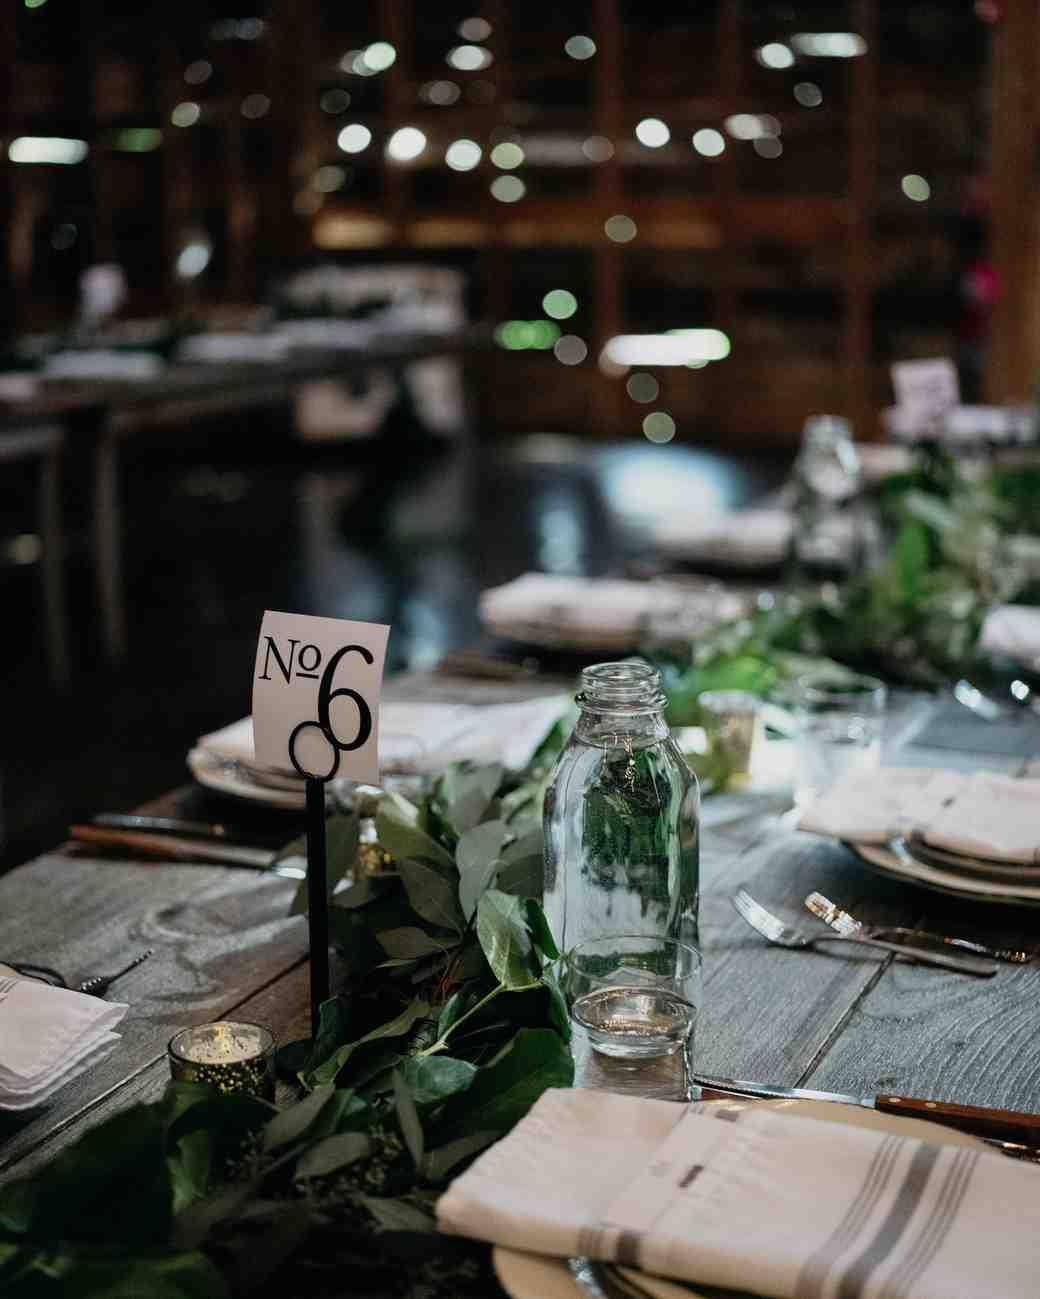 eric-eryc-wedding-tablenumber-150-1018_vert.jpg